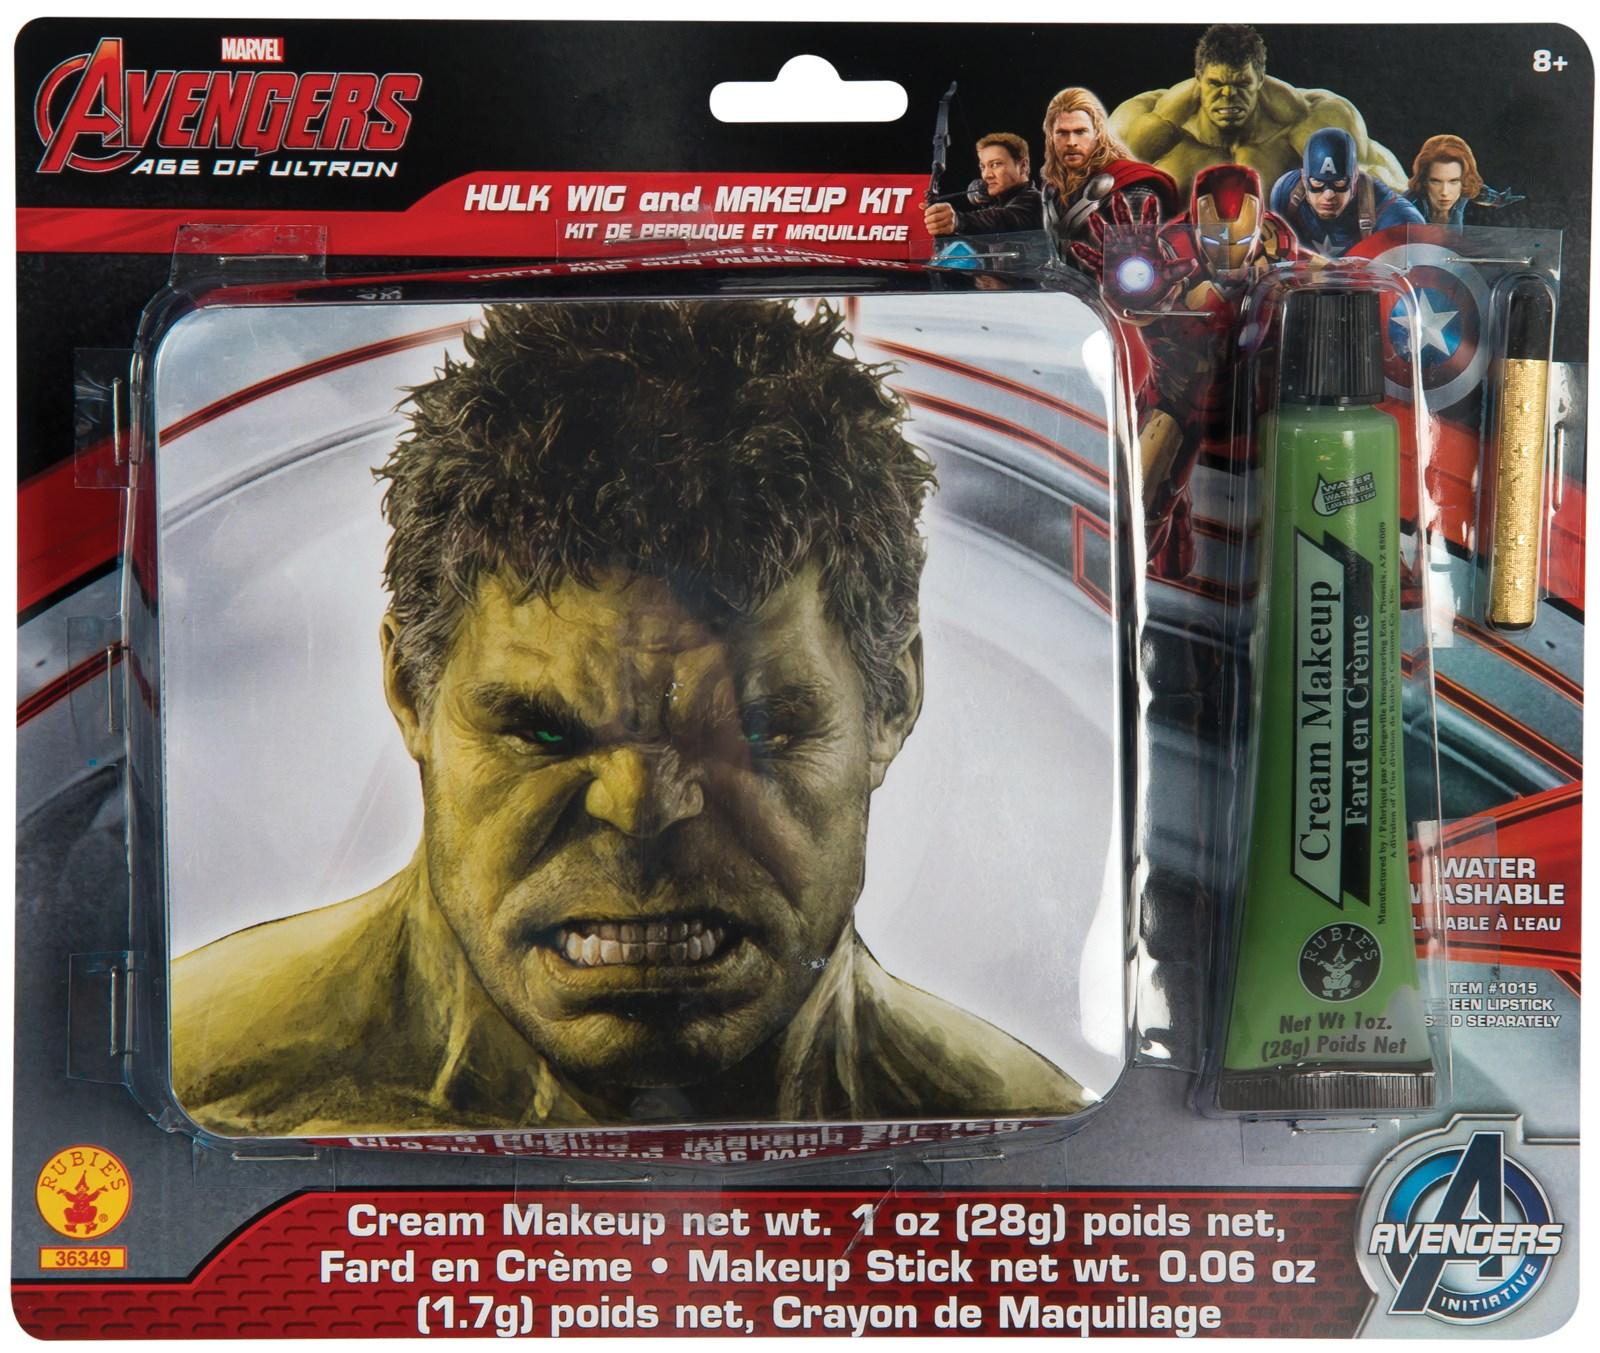 Avengers 2 - Age of Ultron: The Hulk Costume Makeup Kit